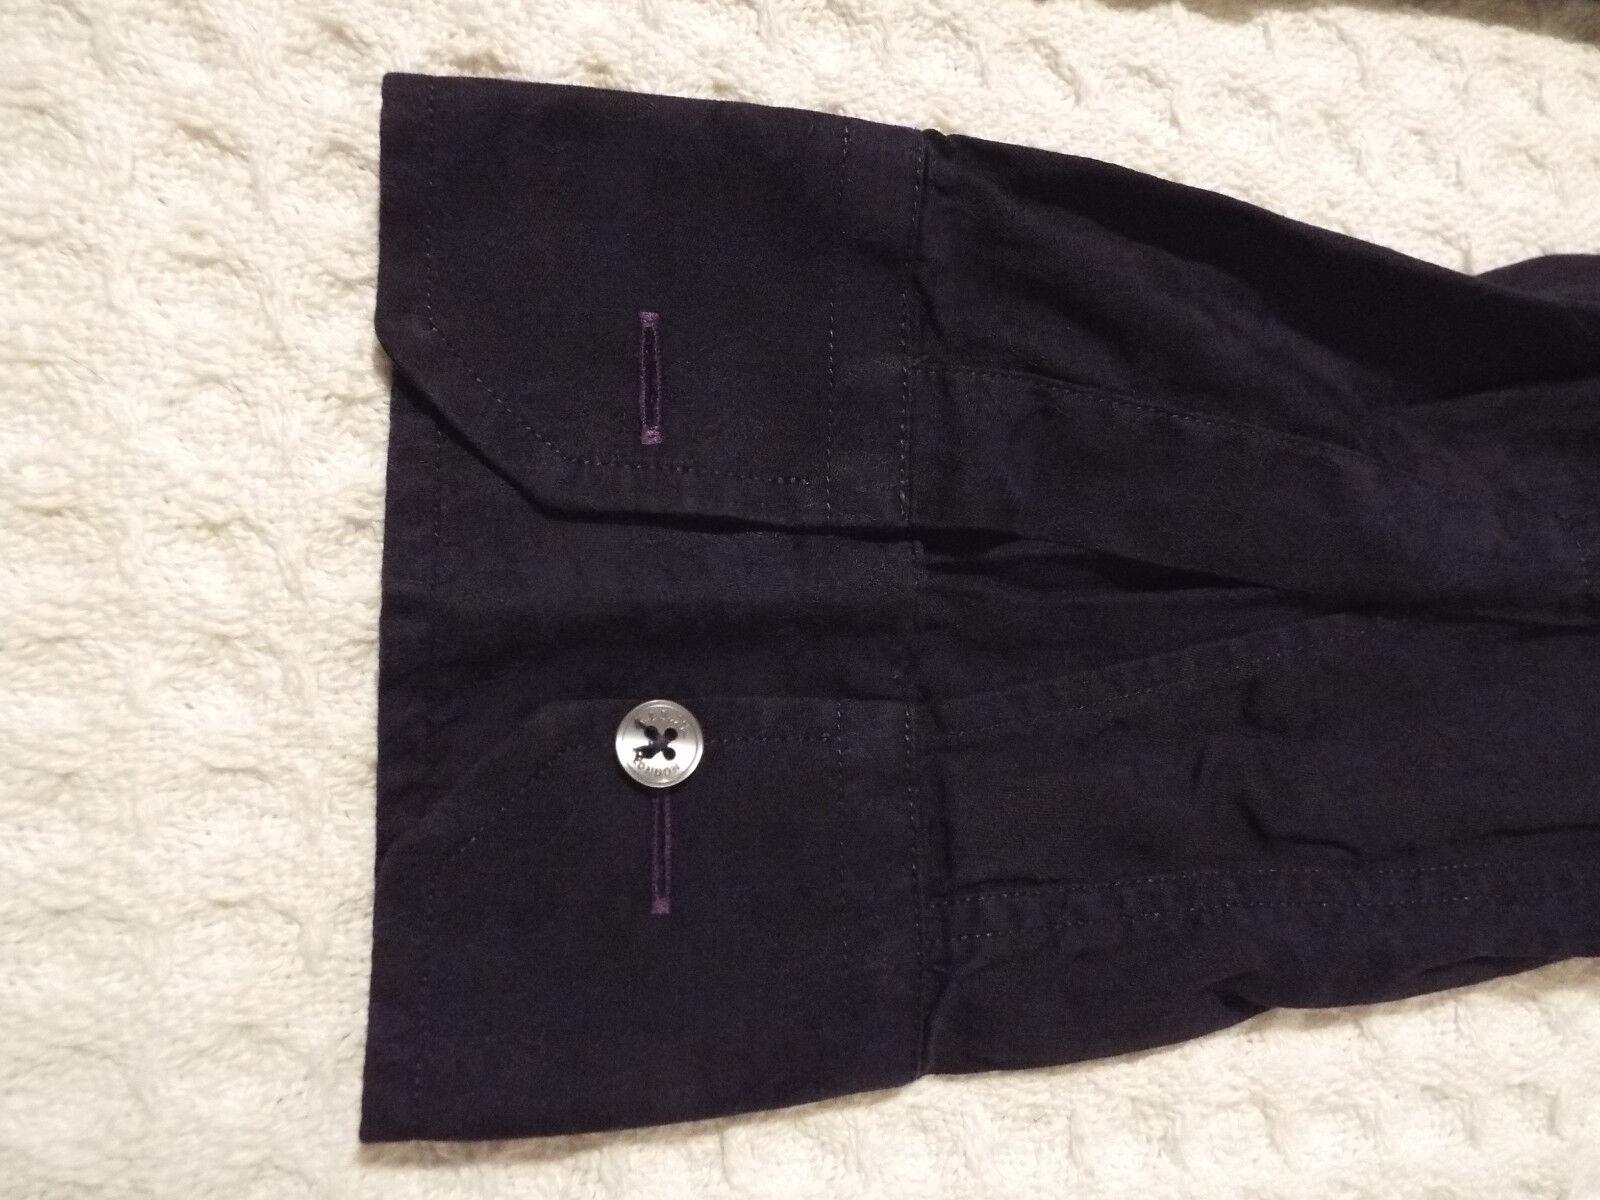 PAUL SMITH Mens Mens Mens Shirt Größe 15.5  (CHEST 44 )  + FLORAL LIBERTY STYLE  | Online-Exportgeschäft  ee0054